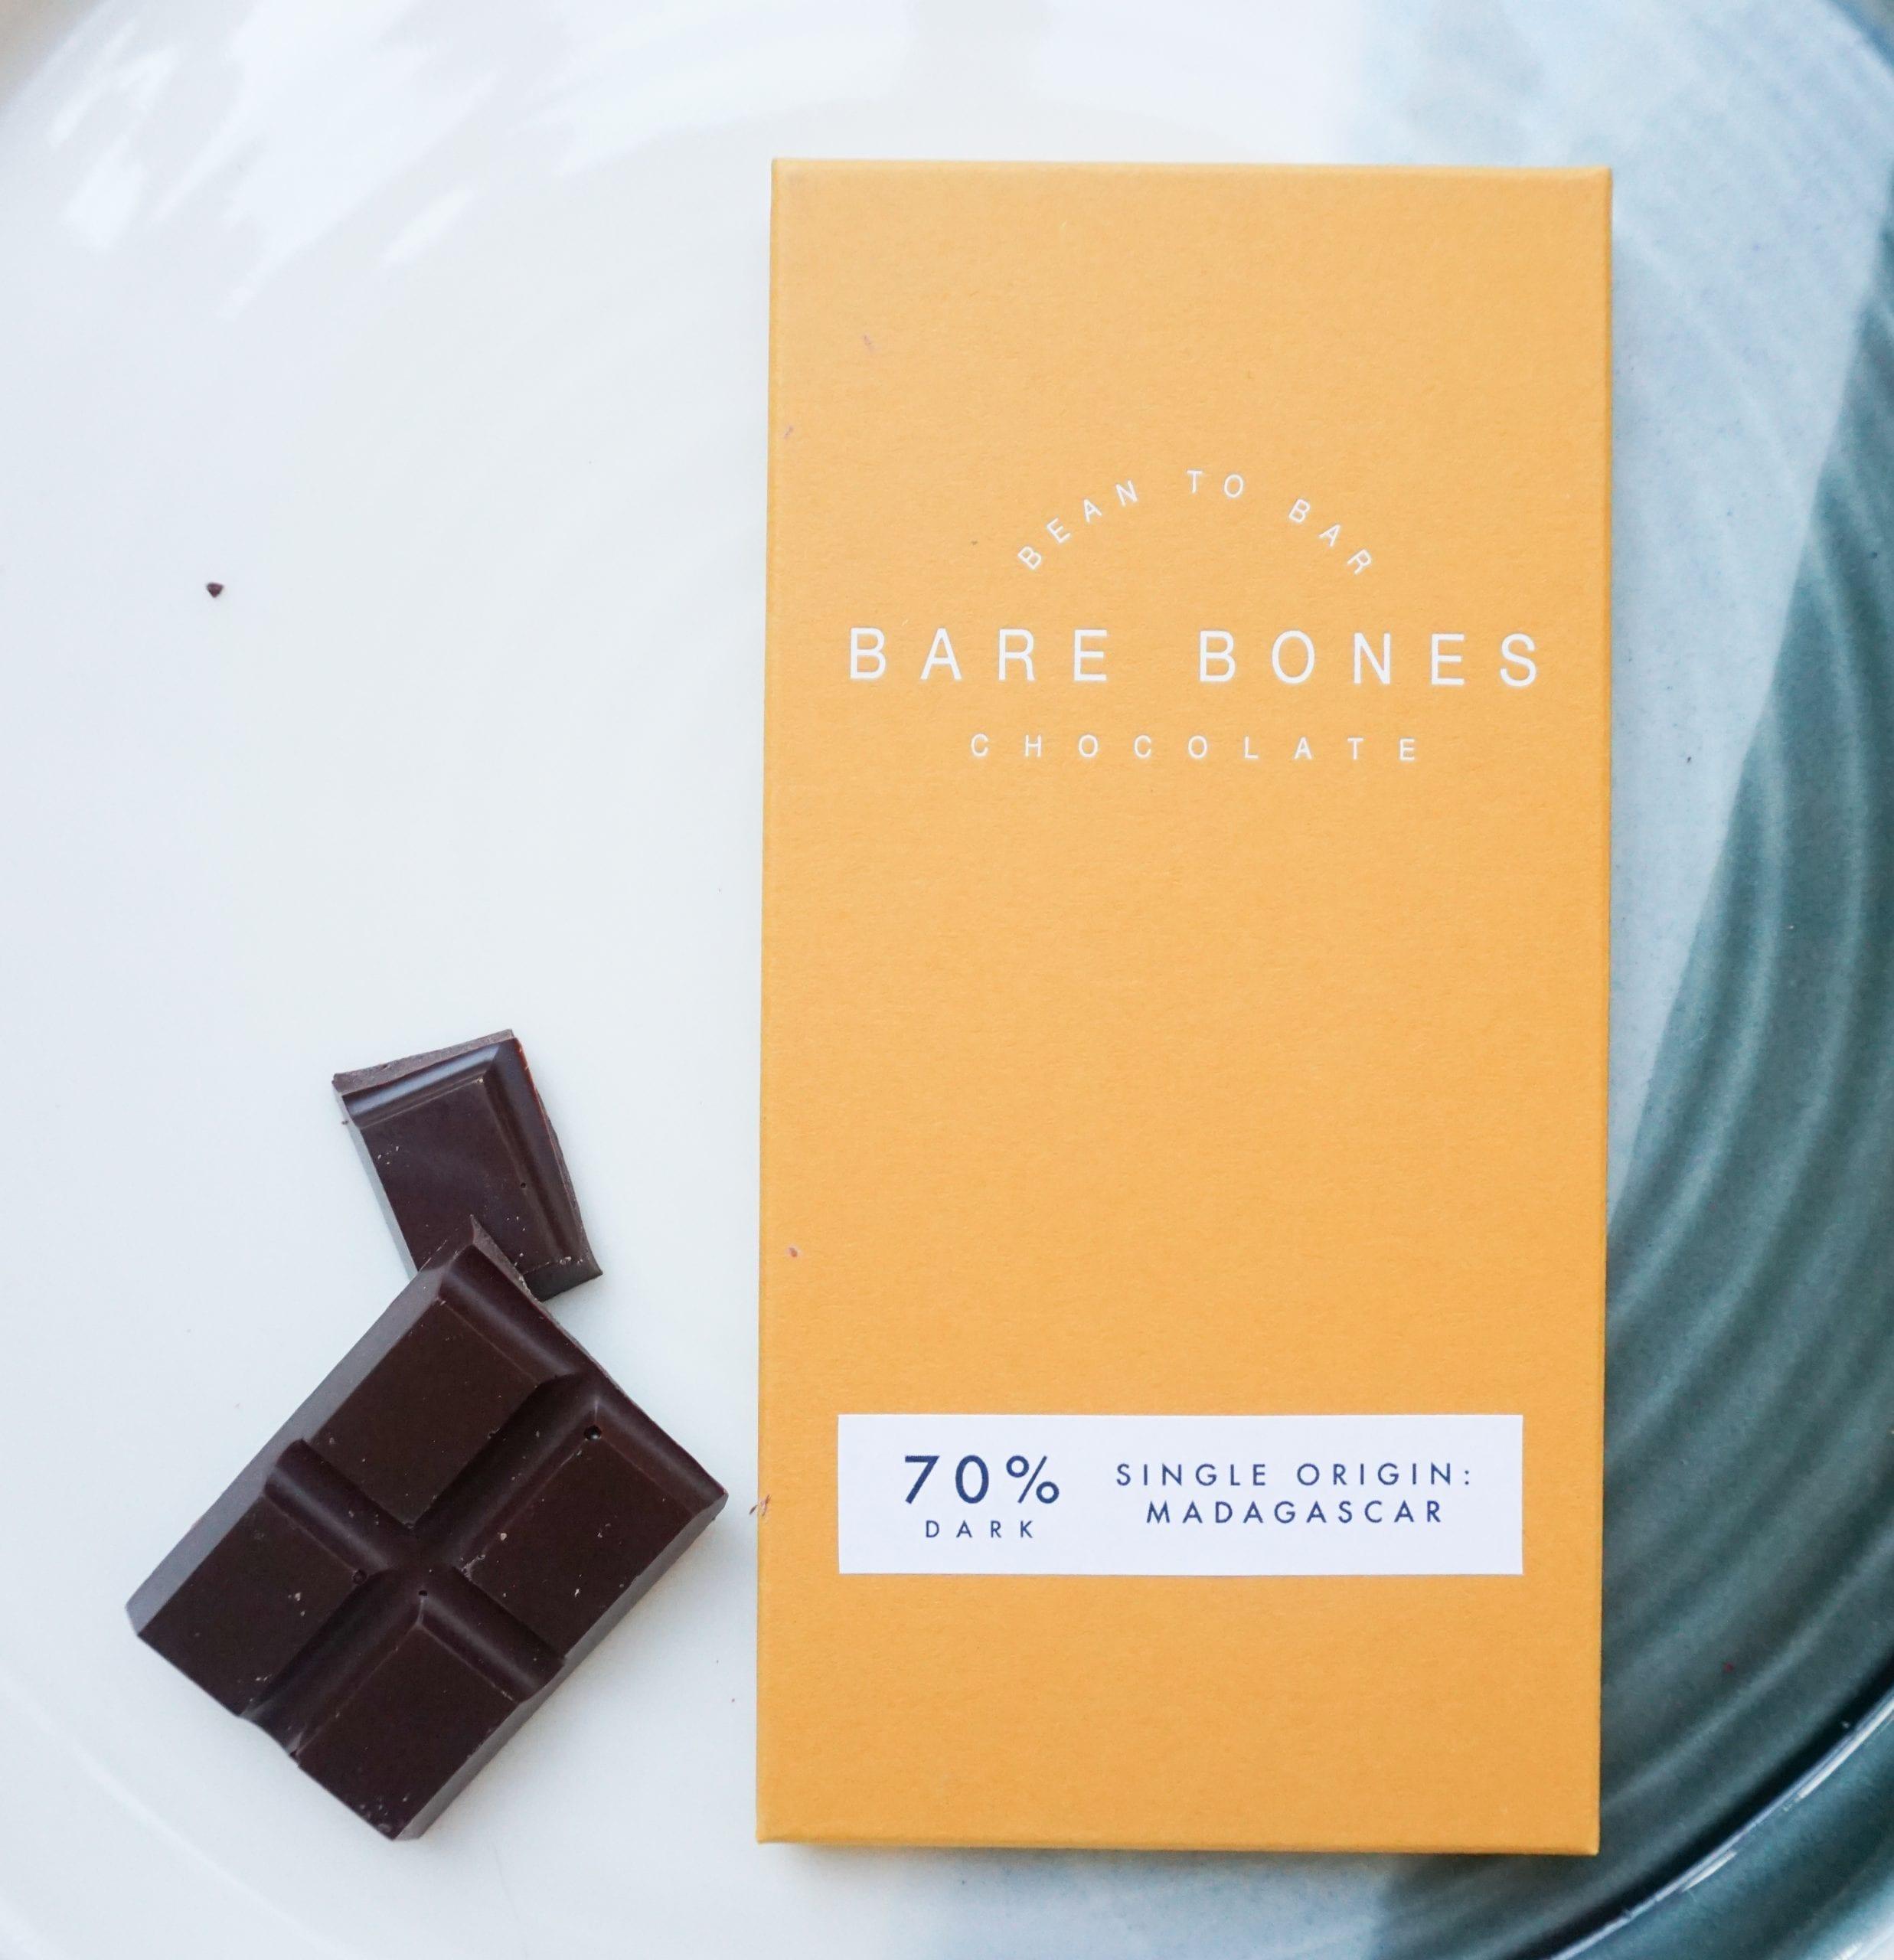 Bare Bones 70% Chocolate